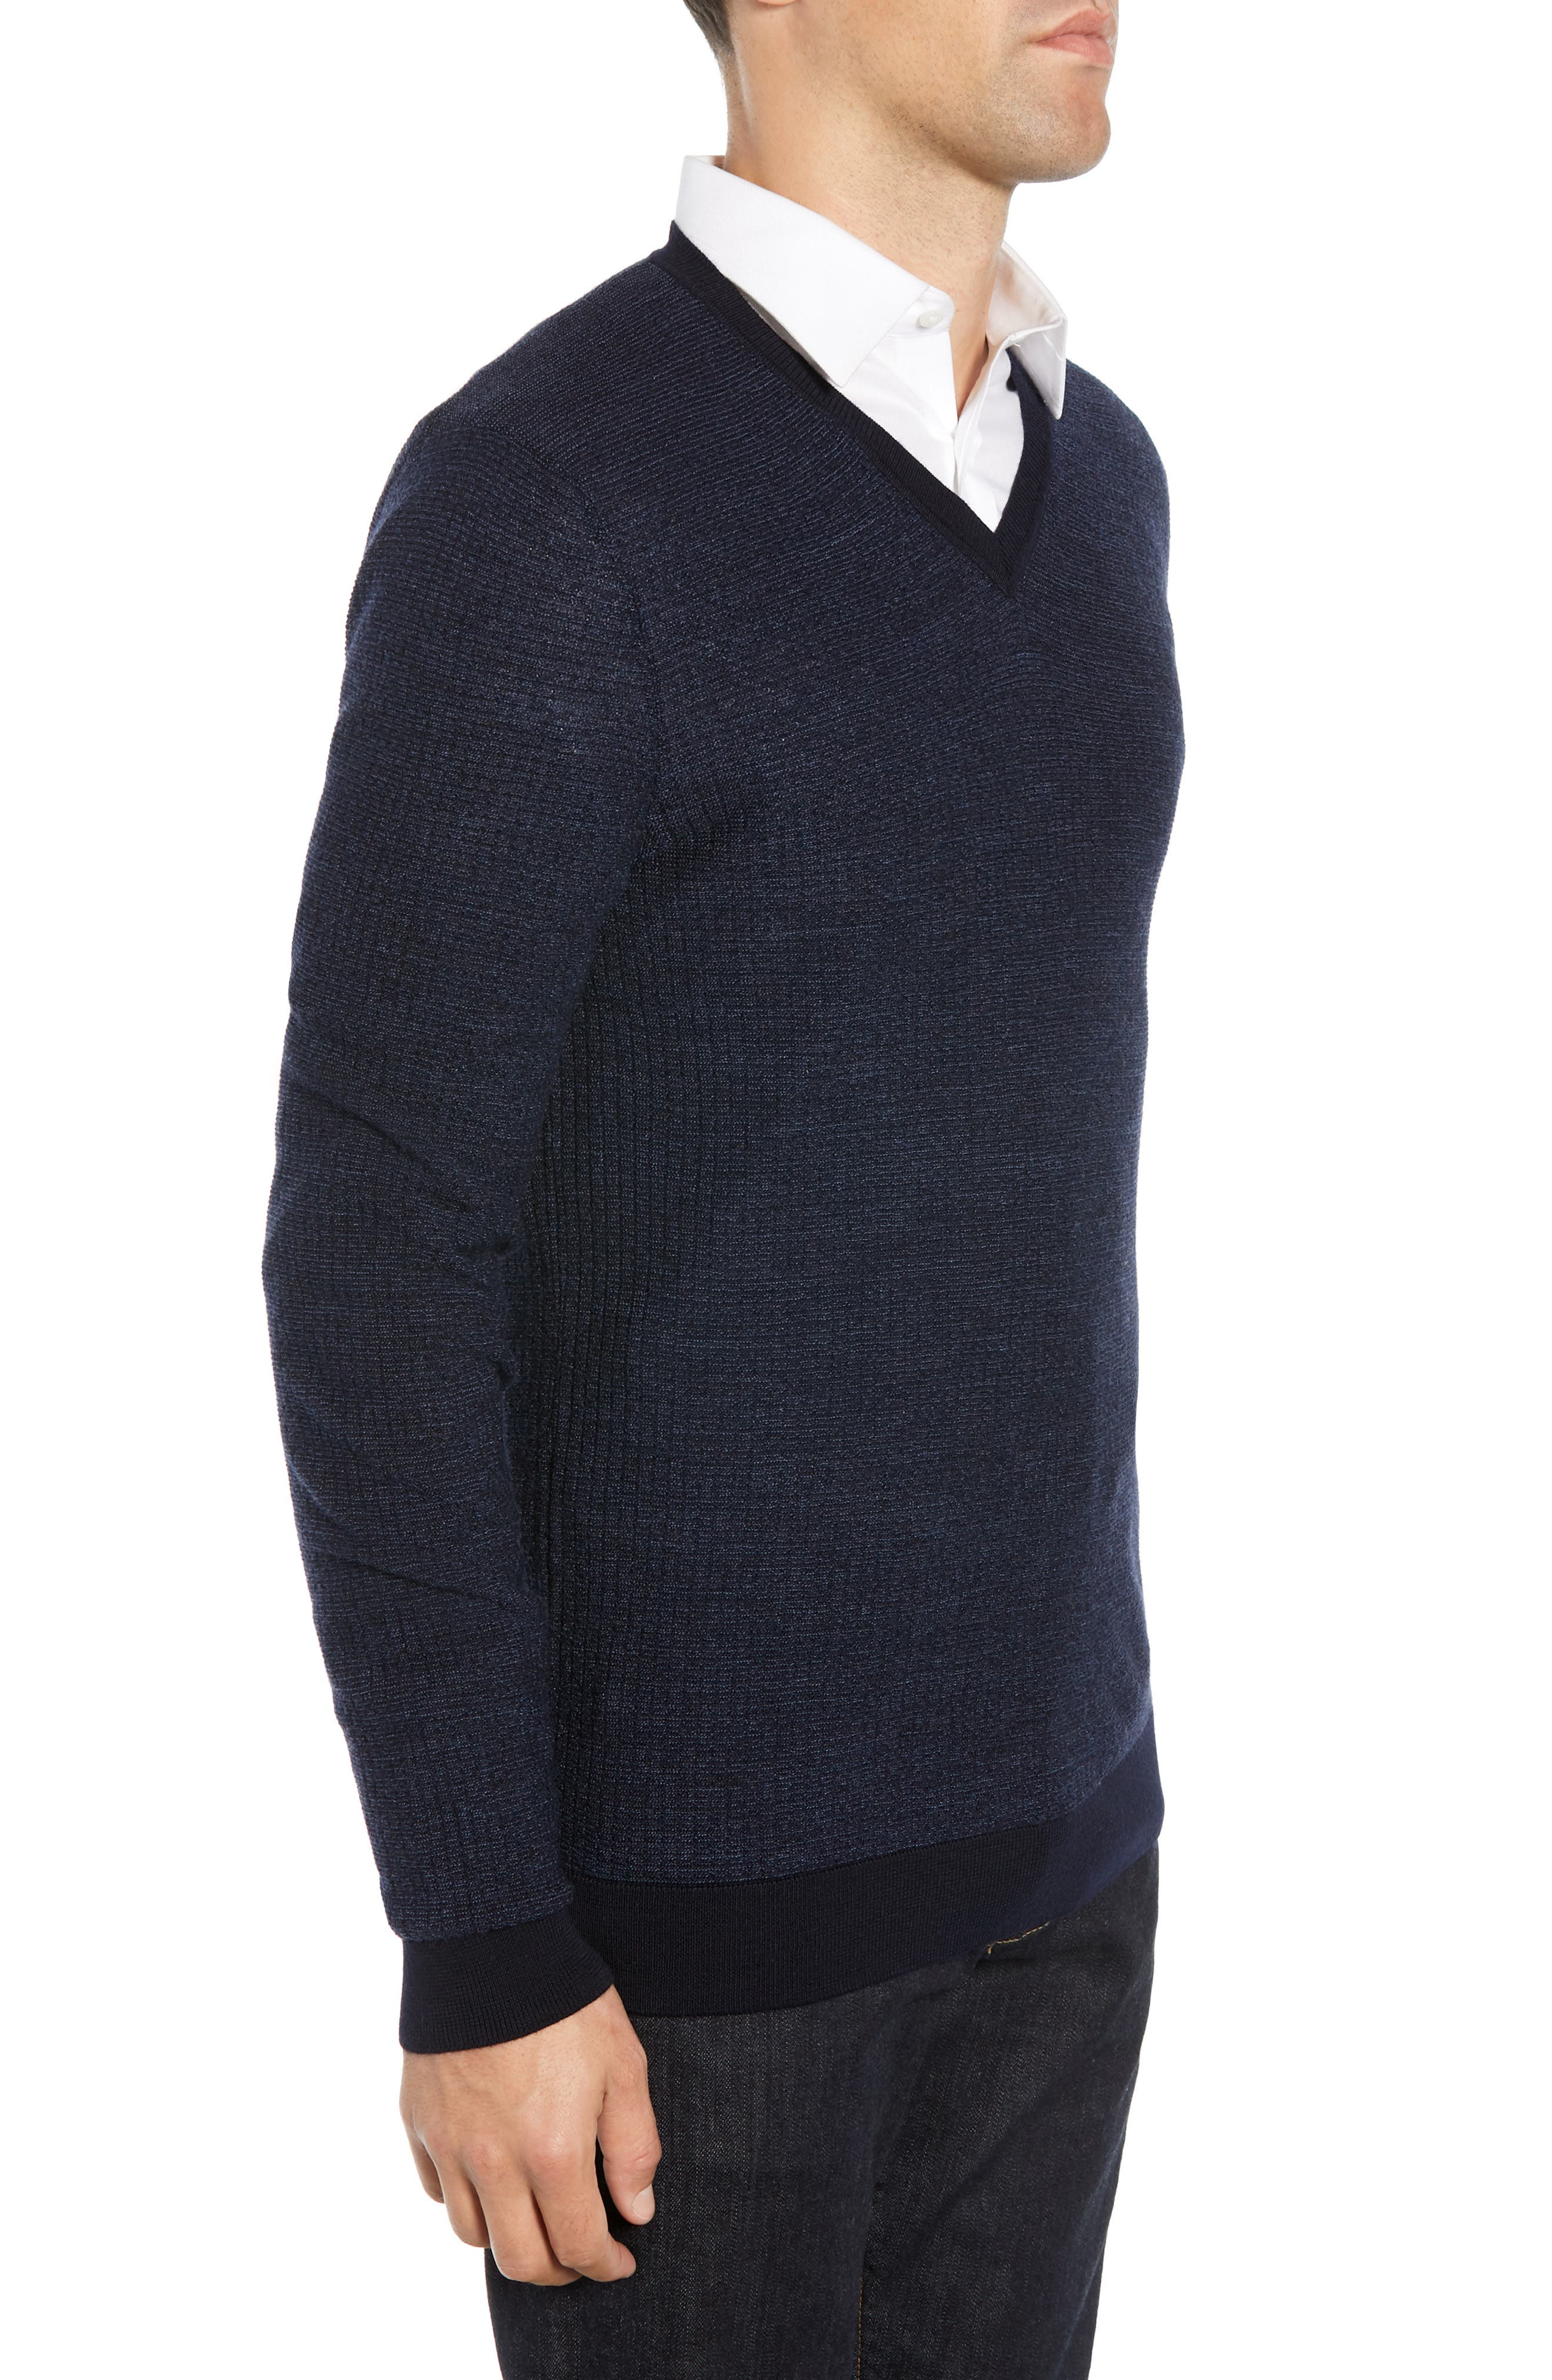 Emauro Mouline V-Neck Slim Fit Sweater,                             Alternate thumbnail 3, color,                             BLUE